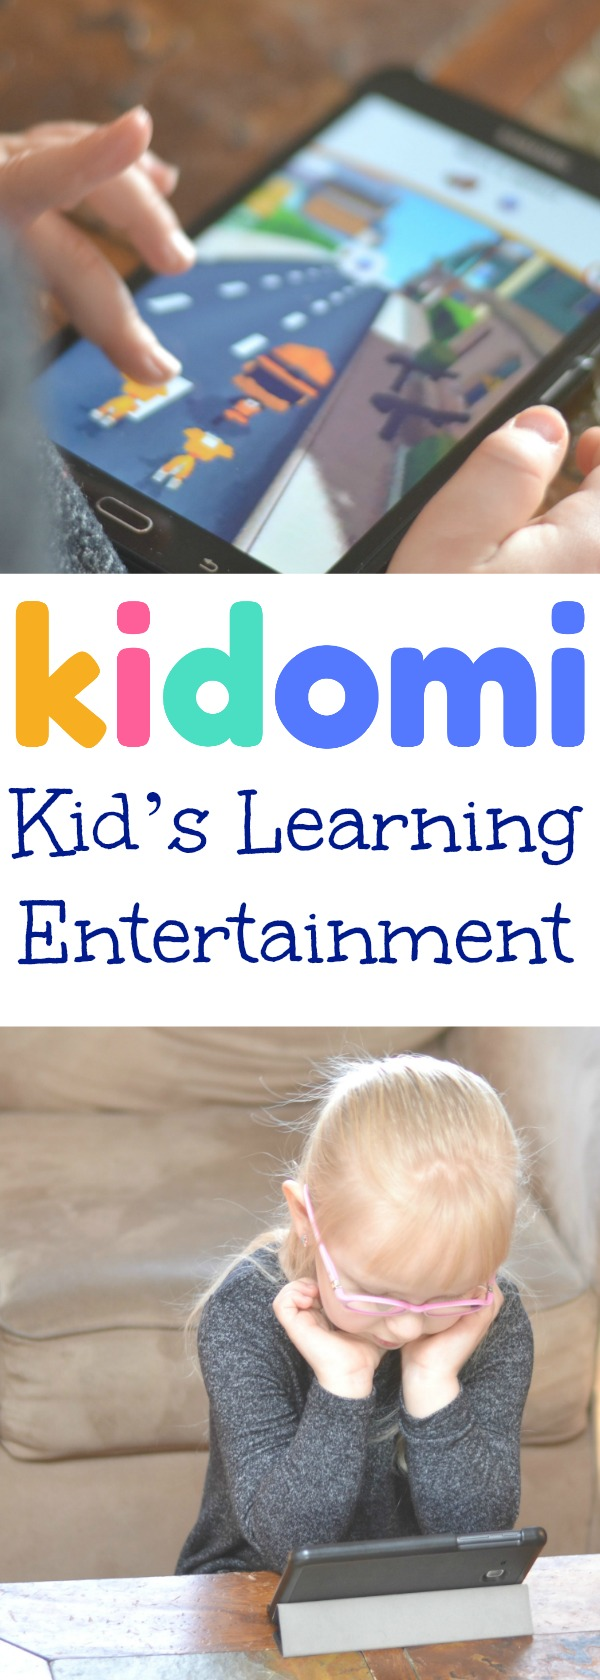 kidomi app, apps for kids, learning apps for kids, kidomi learning app, kidomi for tablets, screen time tips for kids, screen time apps for kids